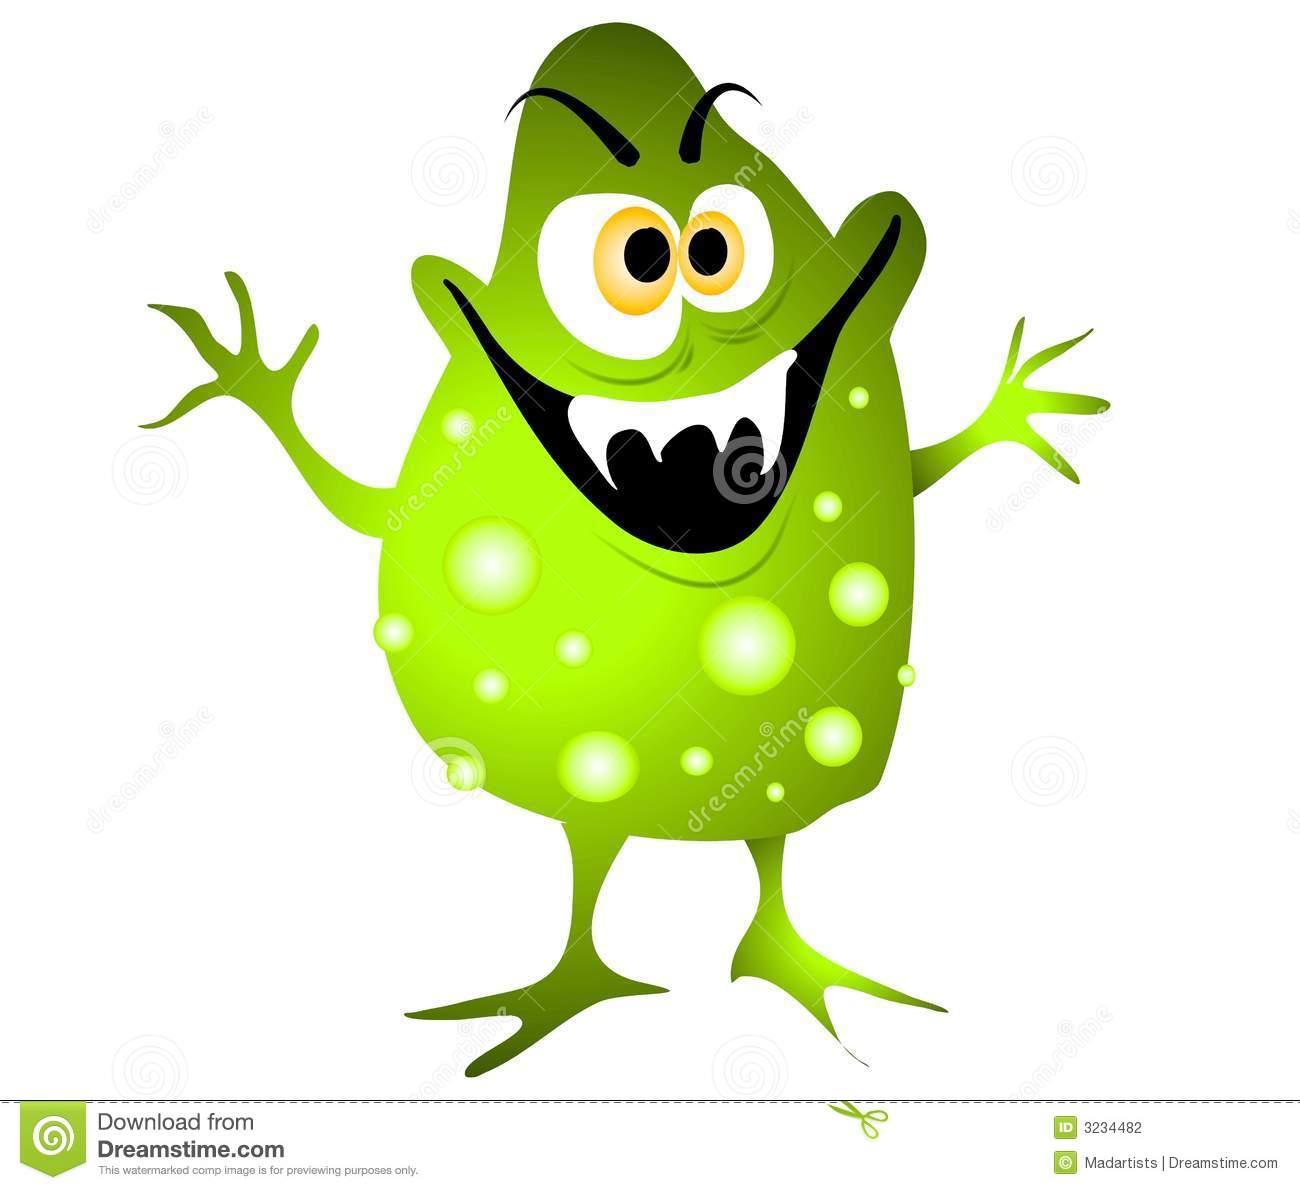 Bacteria clipart sick Germ Clipart Germ Evil cliparts